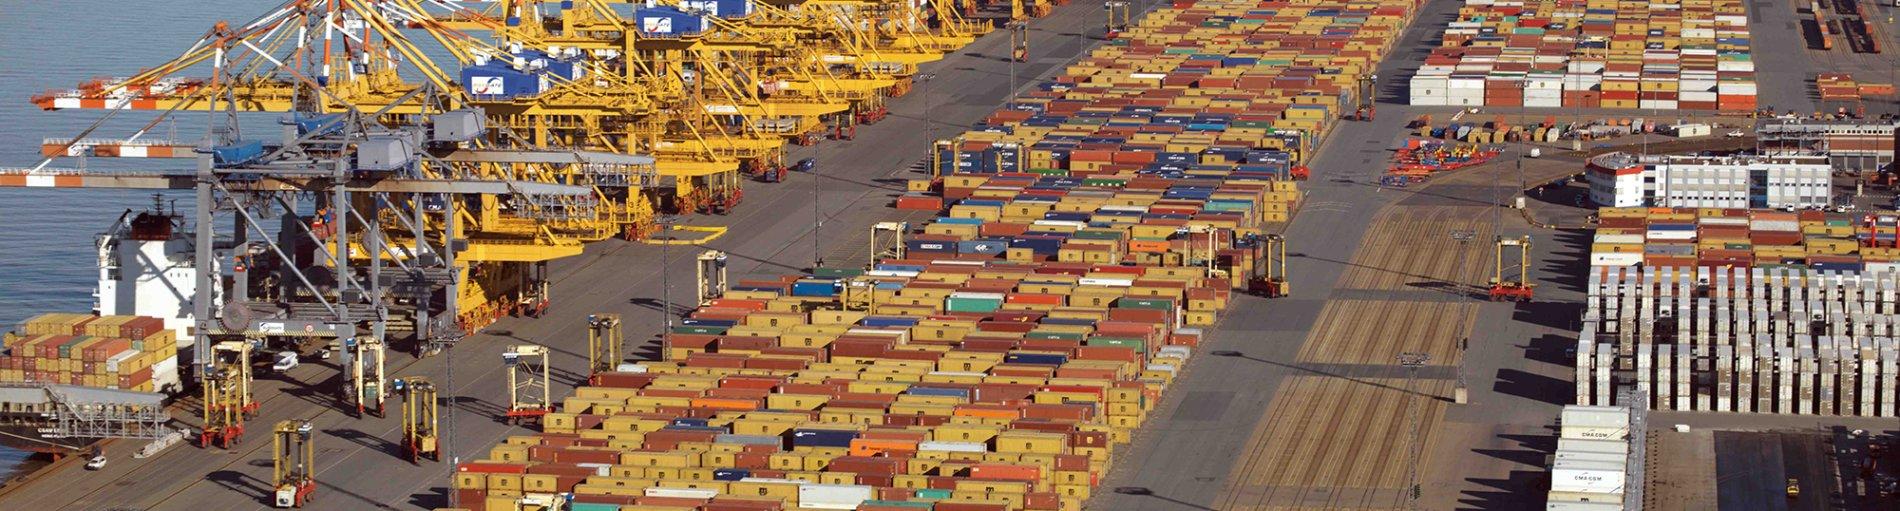 Container Terminal CT1 16.4.14 (Quelle: bremenports und BLG LOGISTICS)